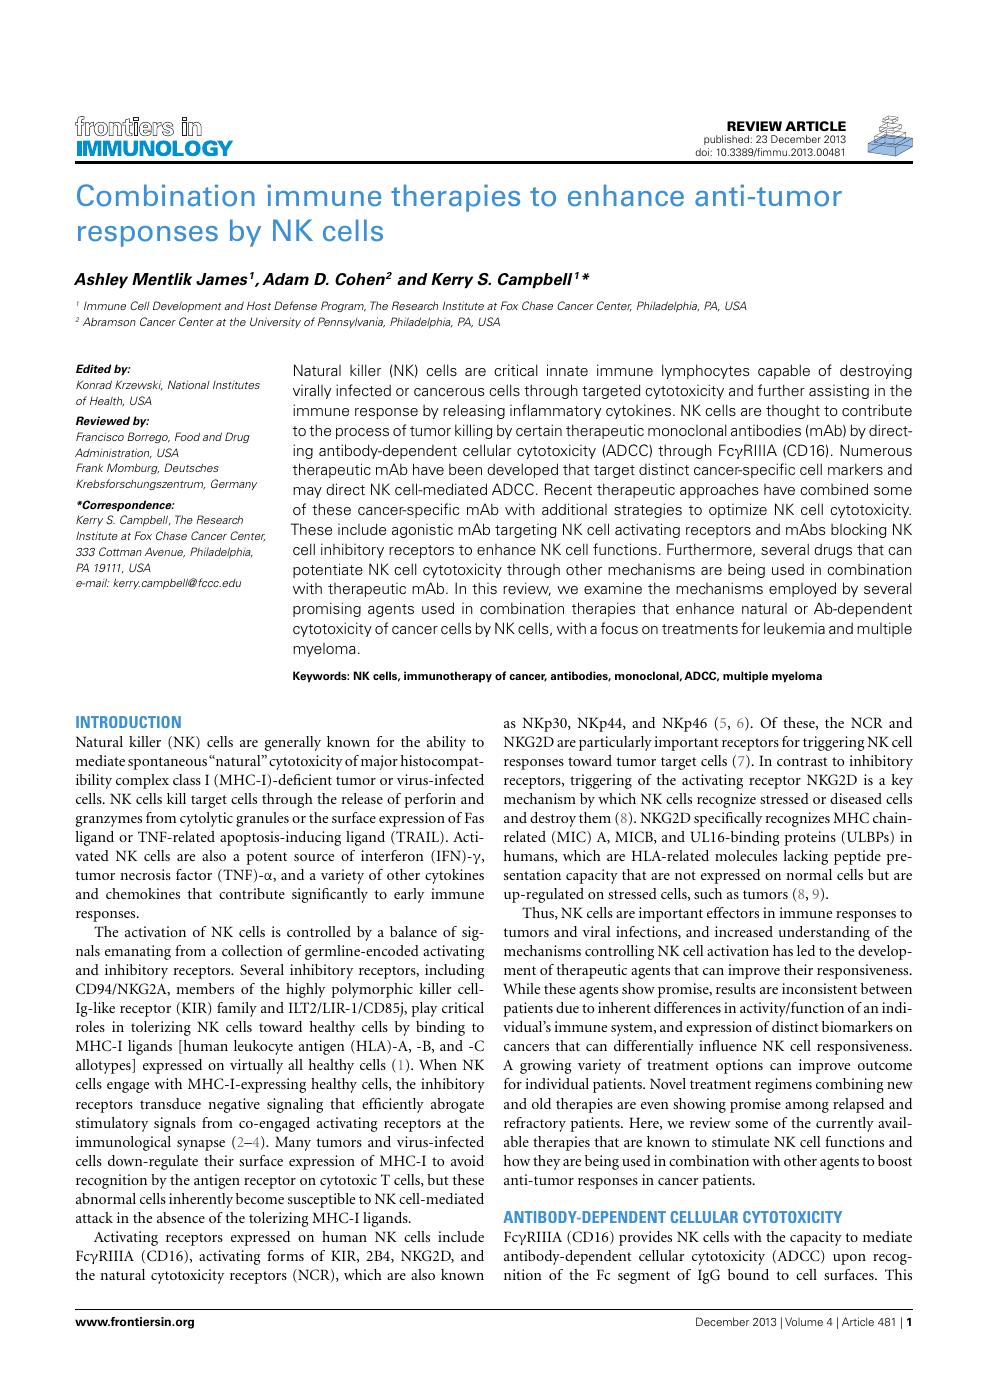 Combination Immune Therapies to Enhance Anti-Tumor Responses